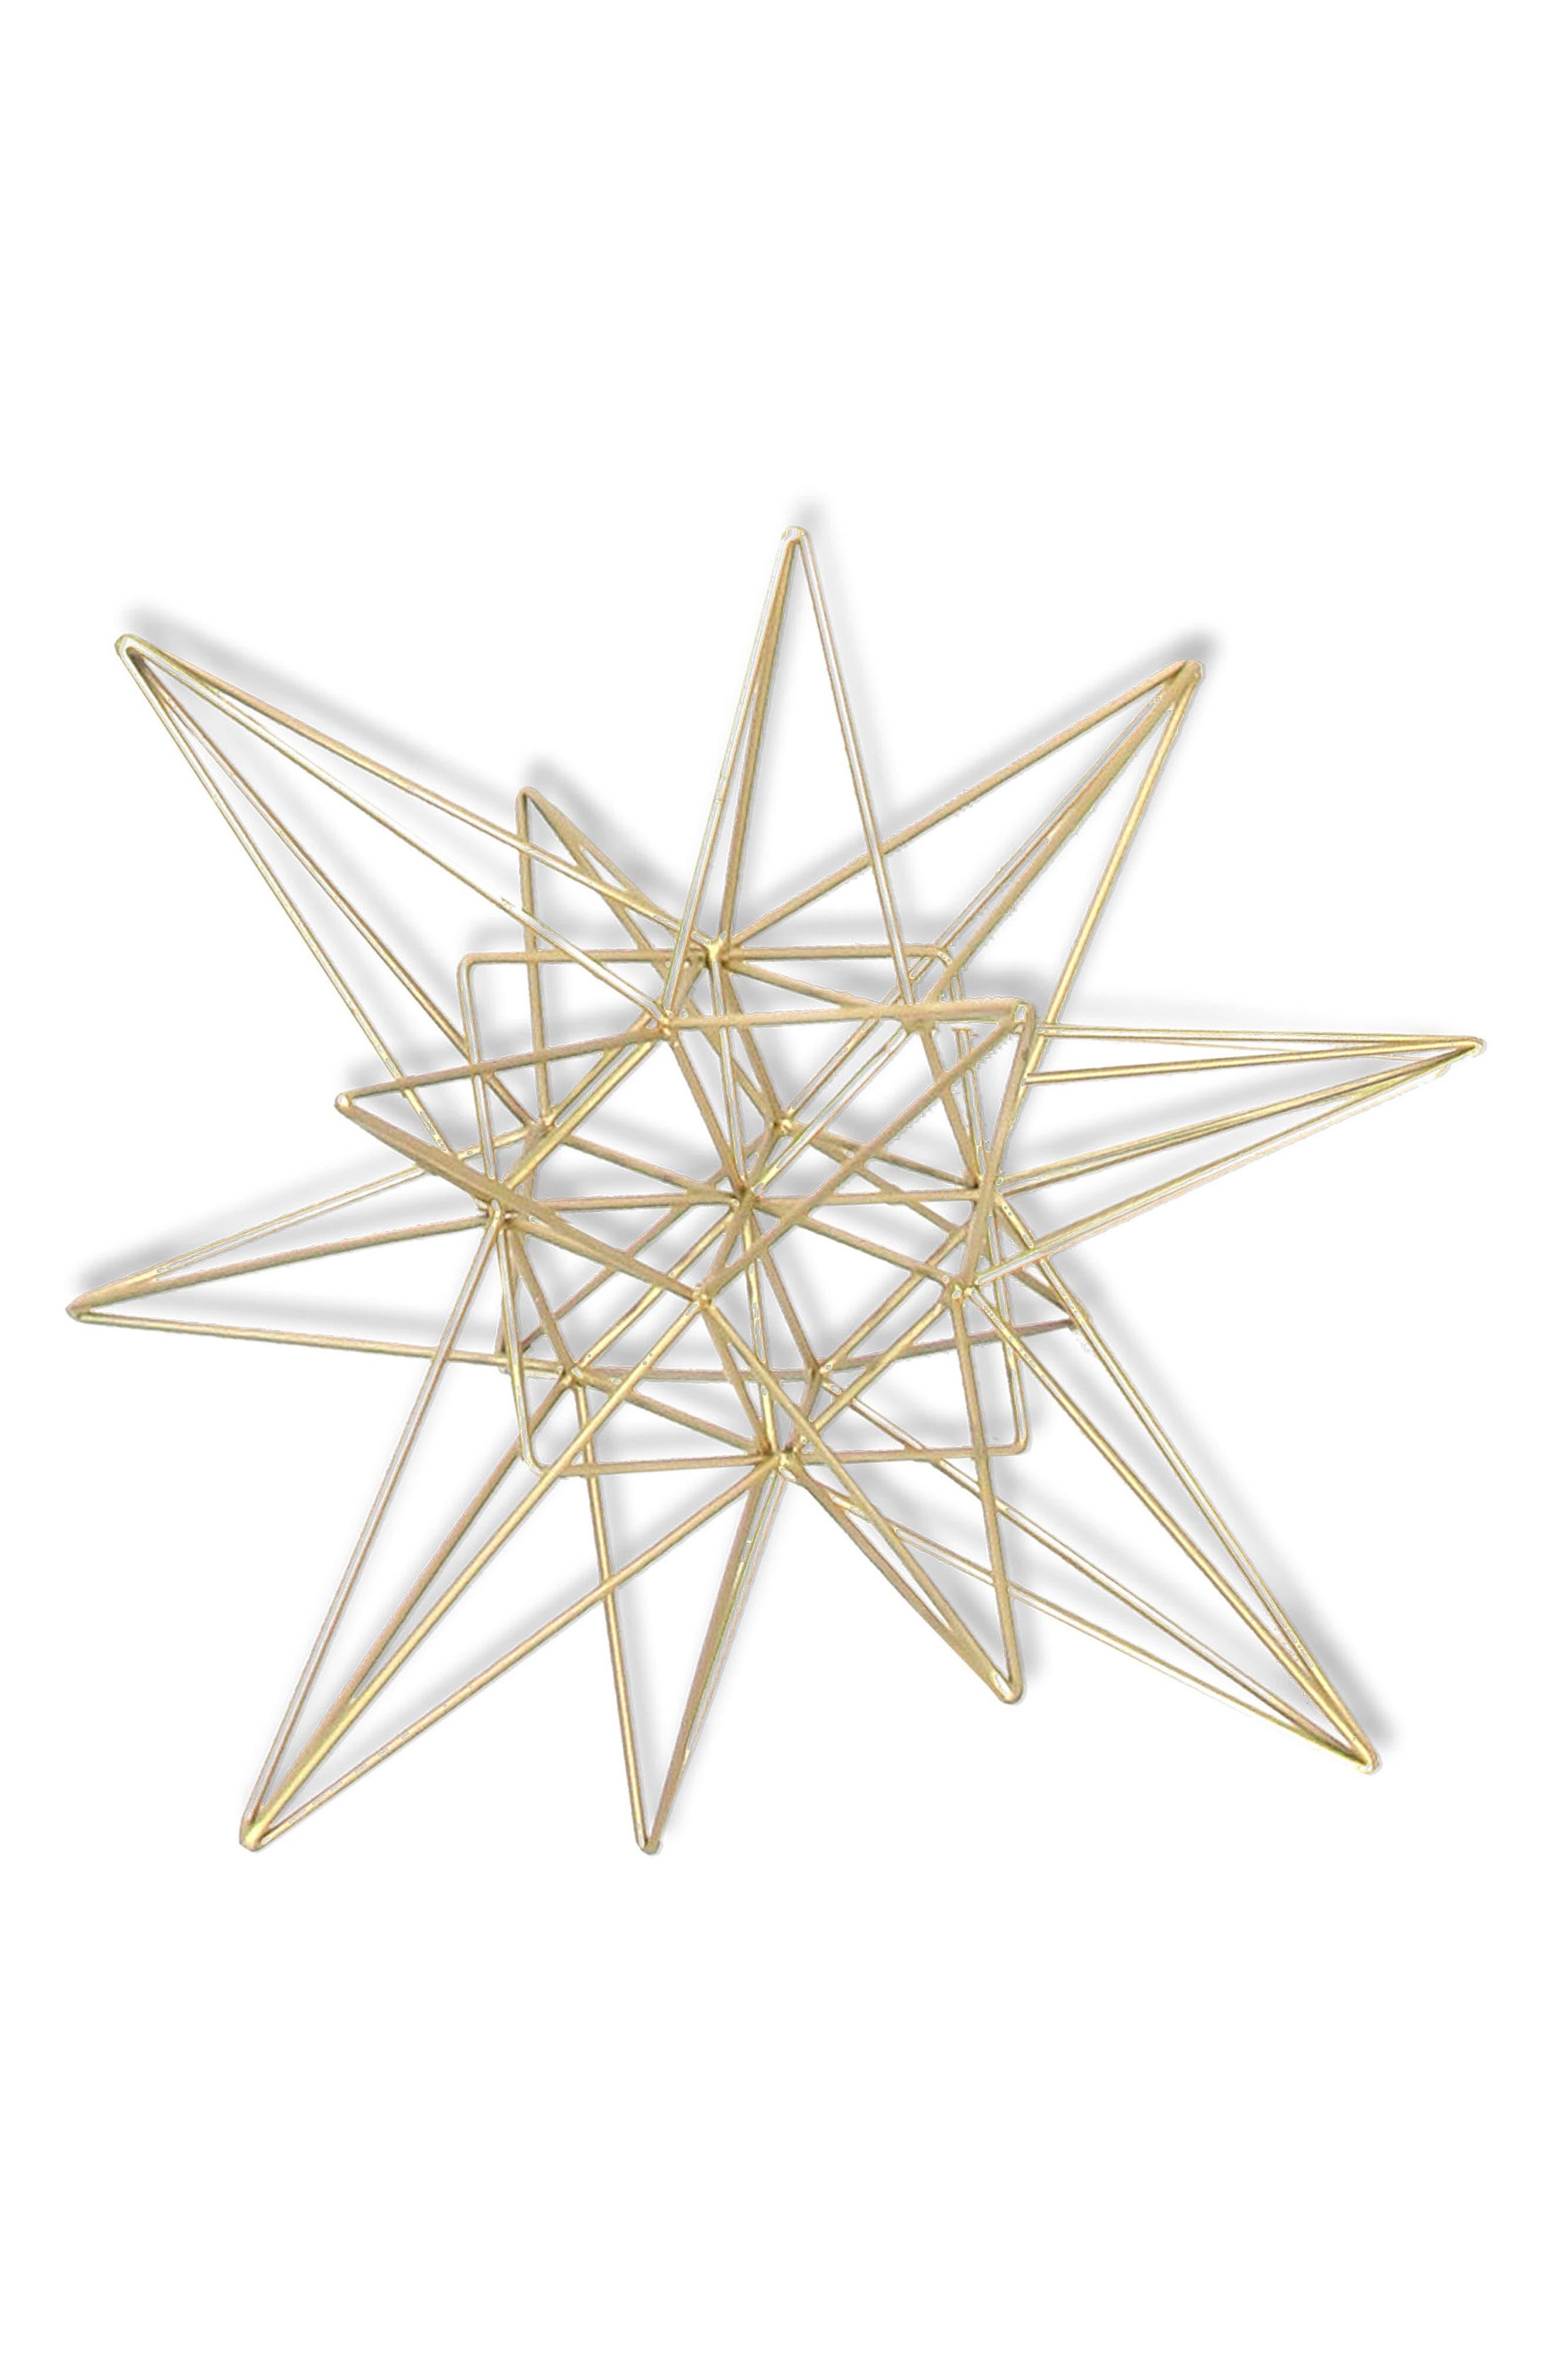 3D Star Goldtone Tabletop Decoration,                         Main,                         color, Gold